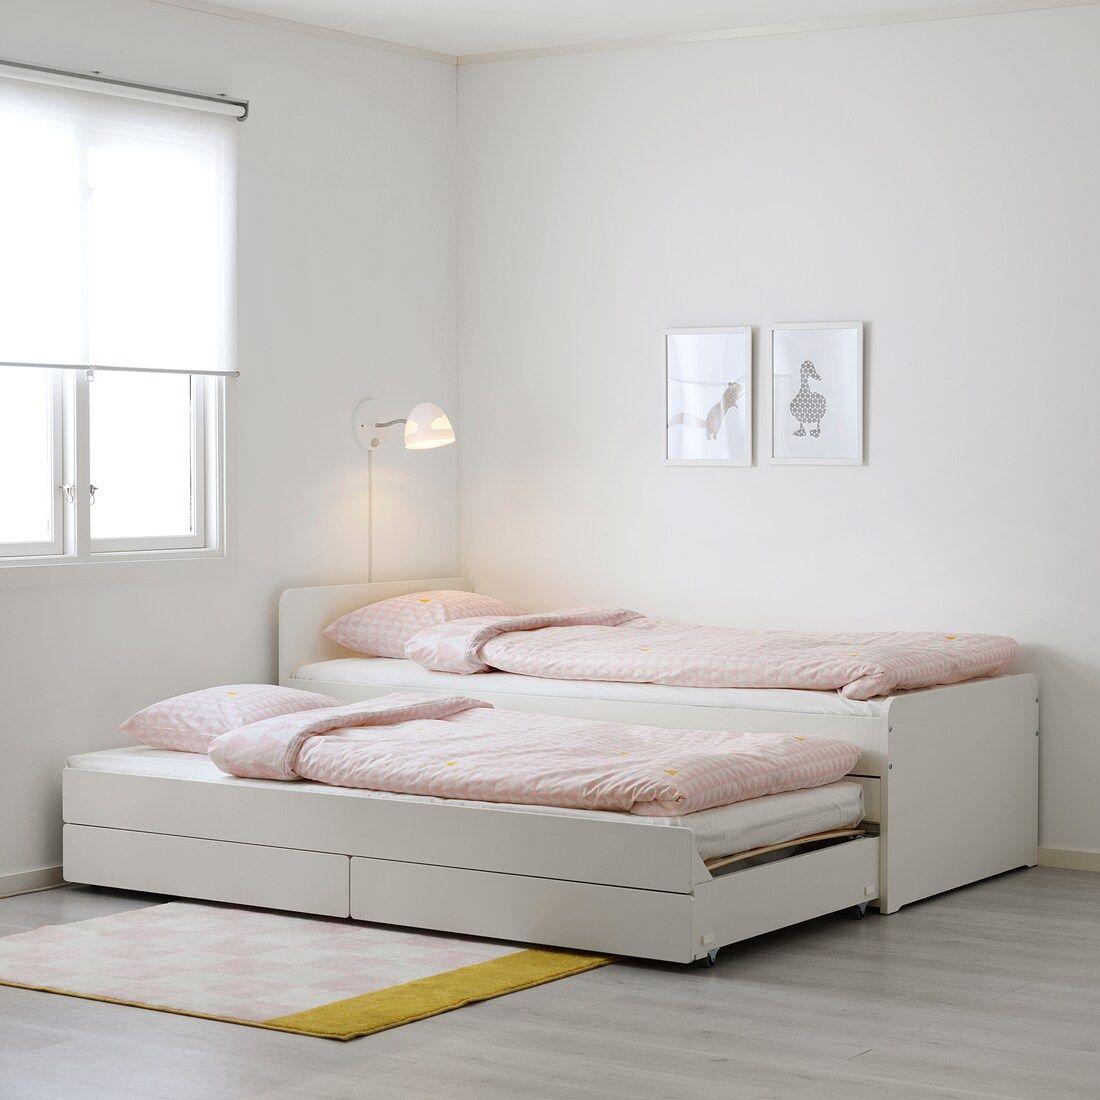 Slakt Bettgestell Unterbett Aufbewahrung Weiss Ikea Deutschland In 2020 Bett Lagerung Bettgestell Schlafzimmer Design